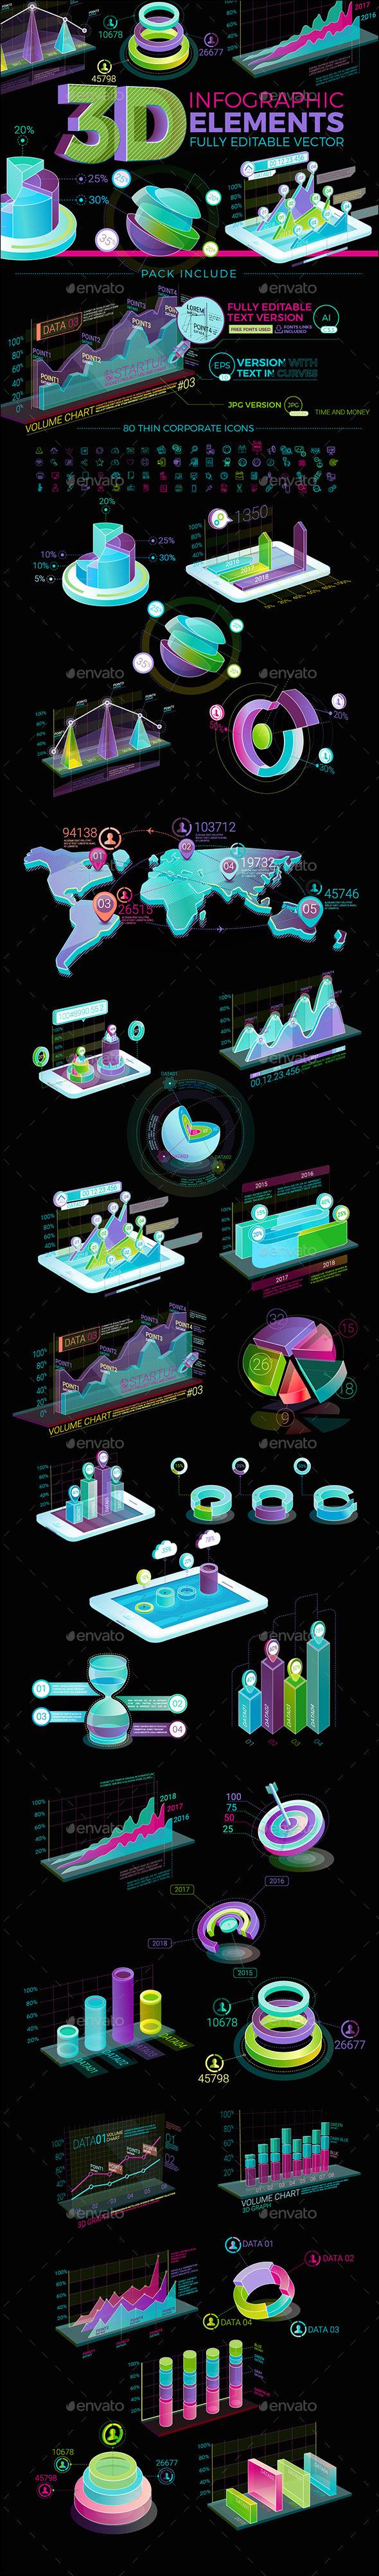 3D Infographic Elements - Infographics